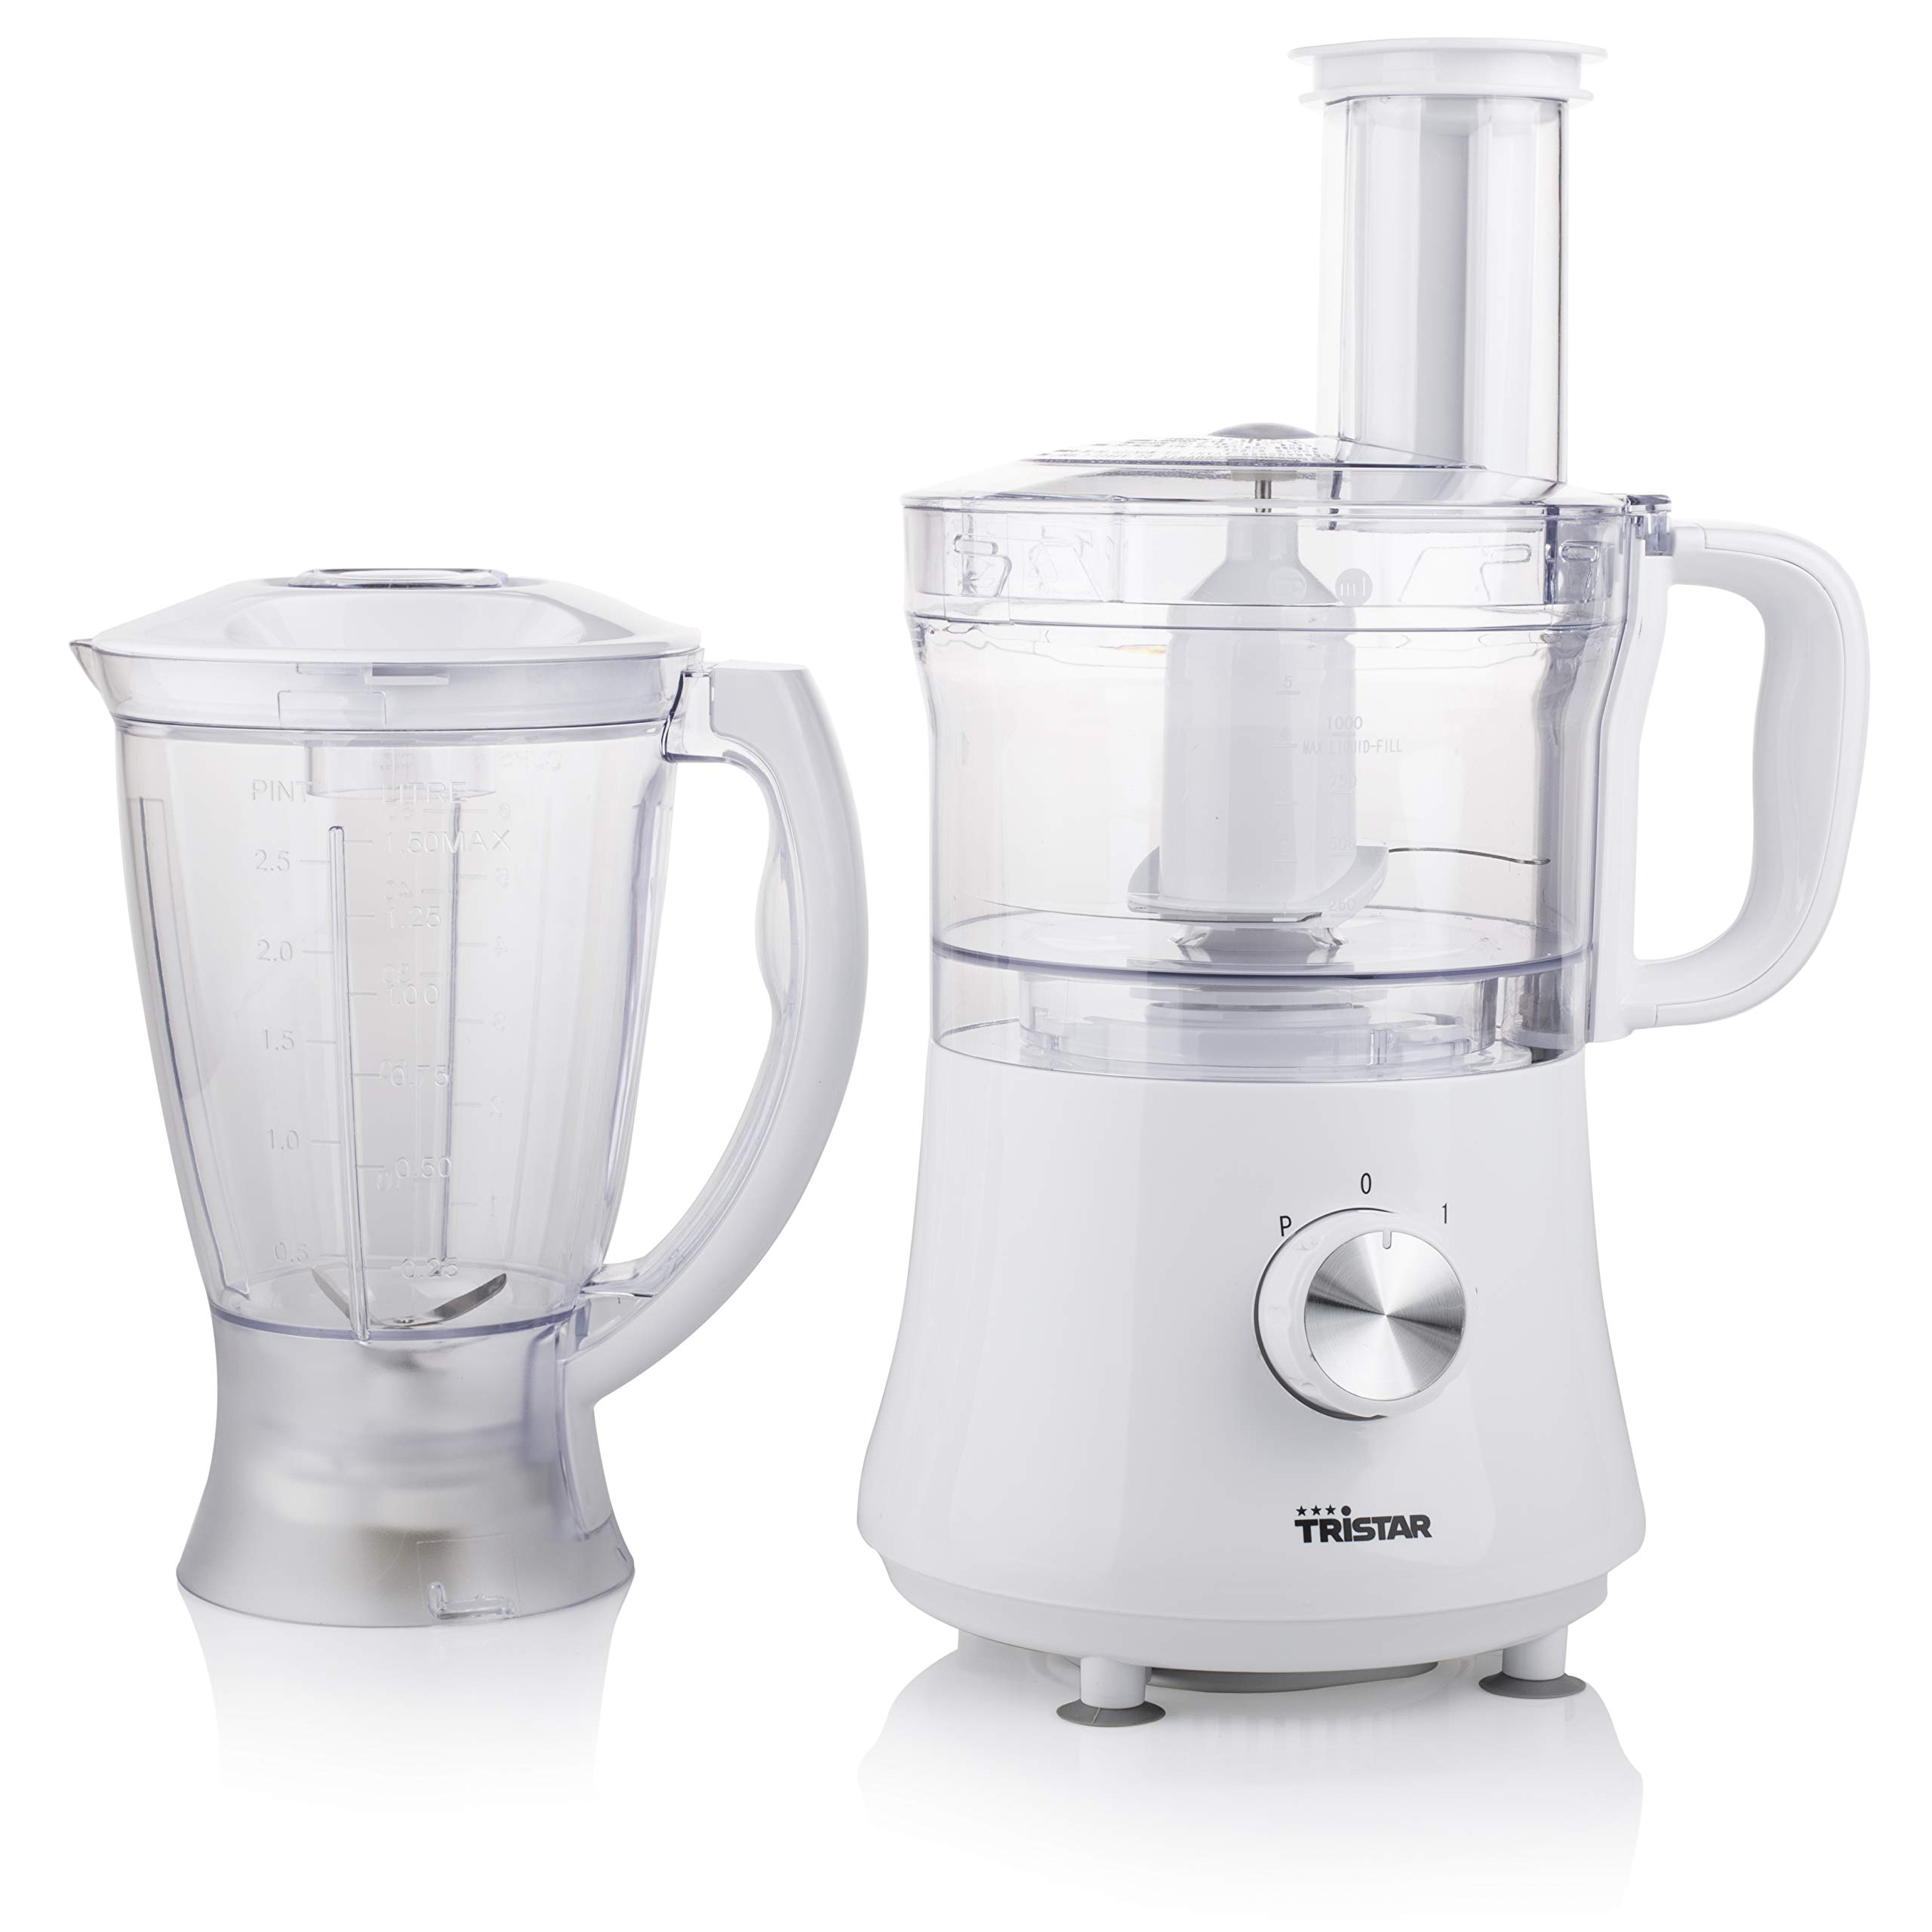 vidaXL Robot de Cocina Tristar + Jarra, 1,5 L: Amazon.es: Hogar